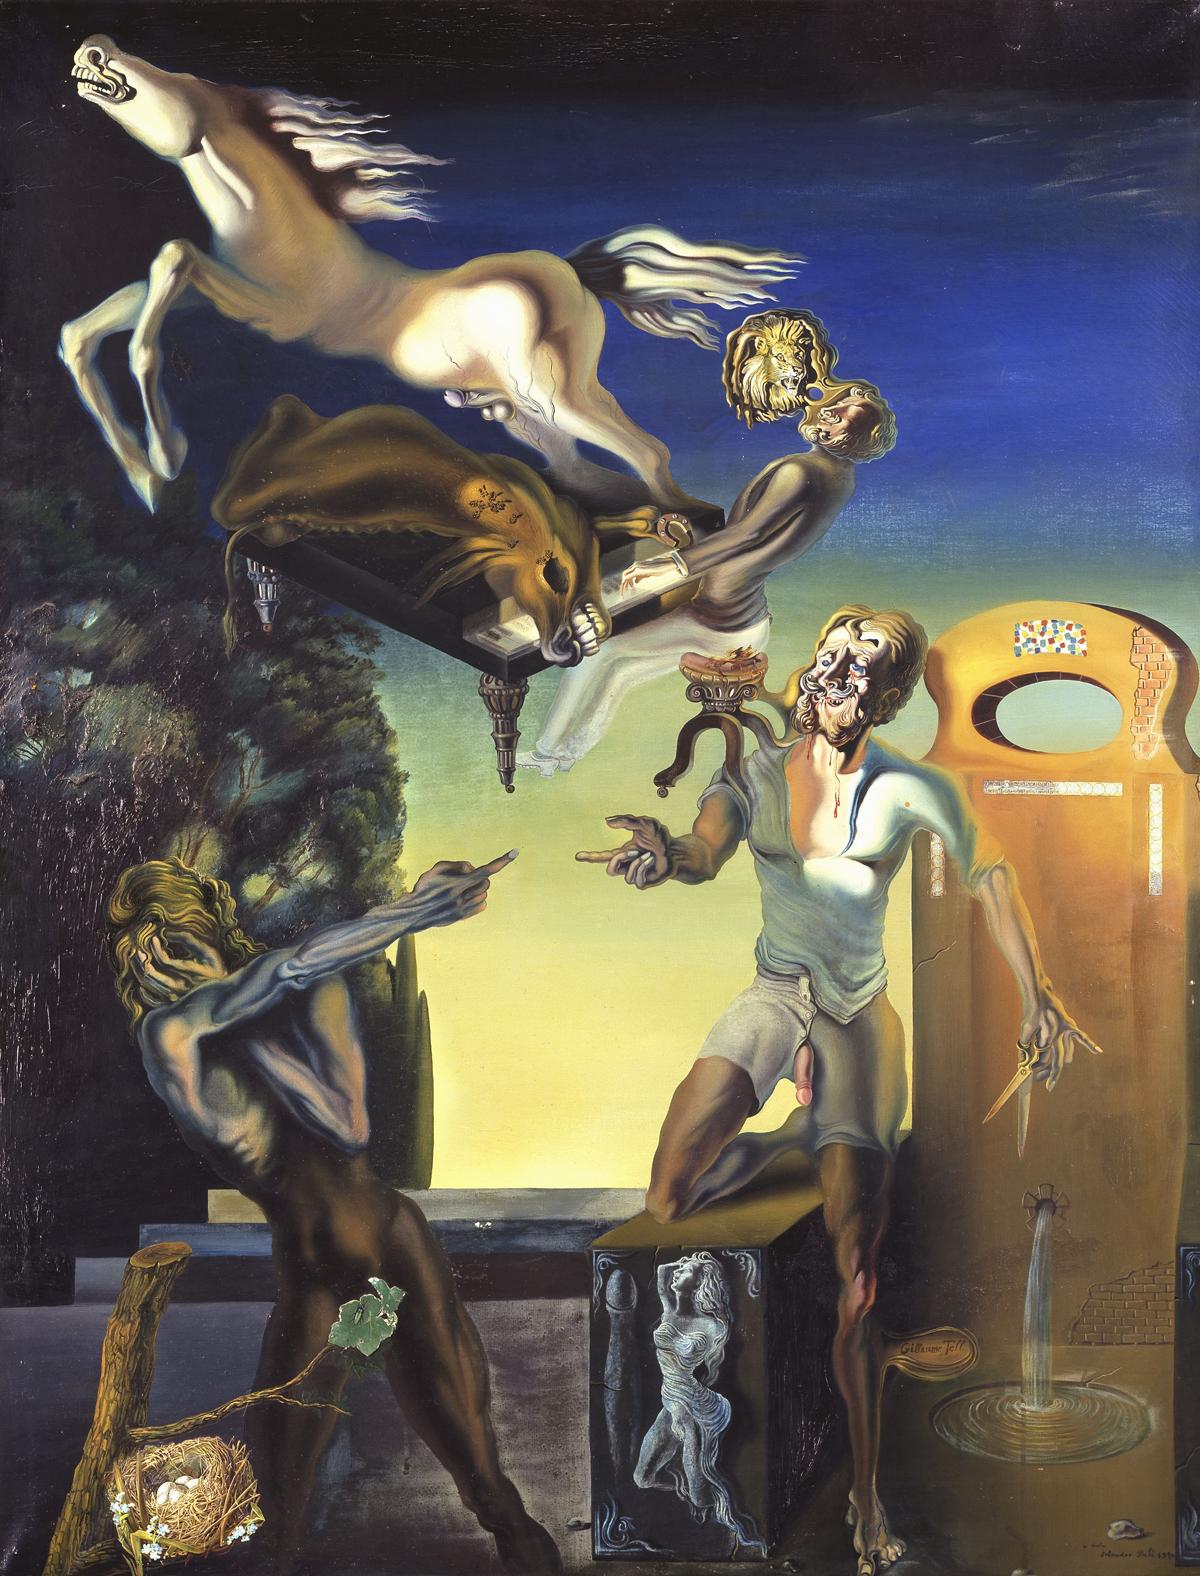 Tác phẩm William Tell do Dali vẽ vào năm 1930 (© Salvador Dali, Fundació Dali, ADAGP Paris 2012)